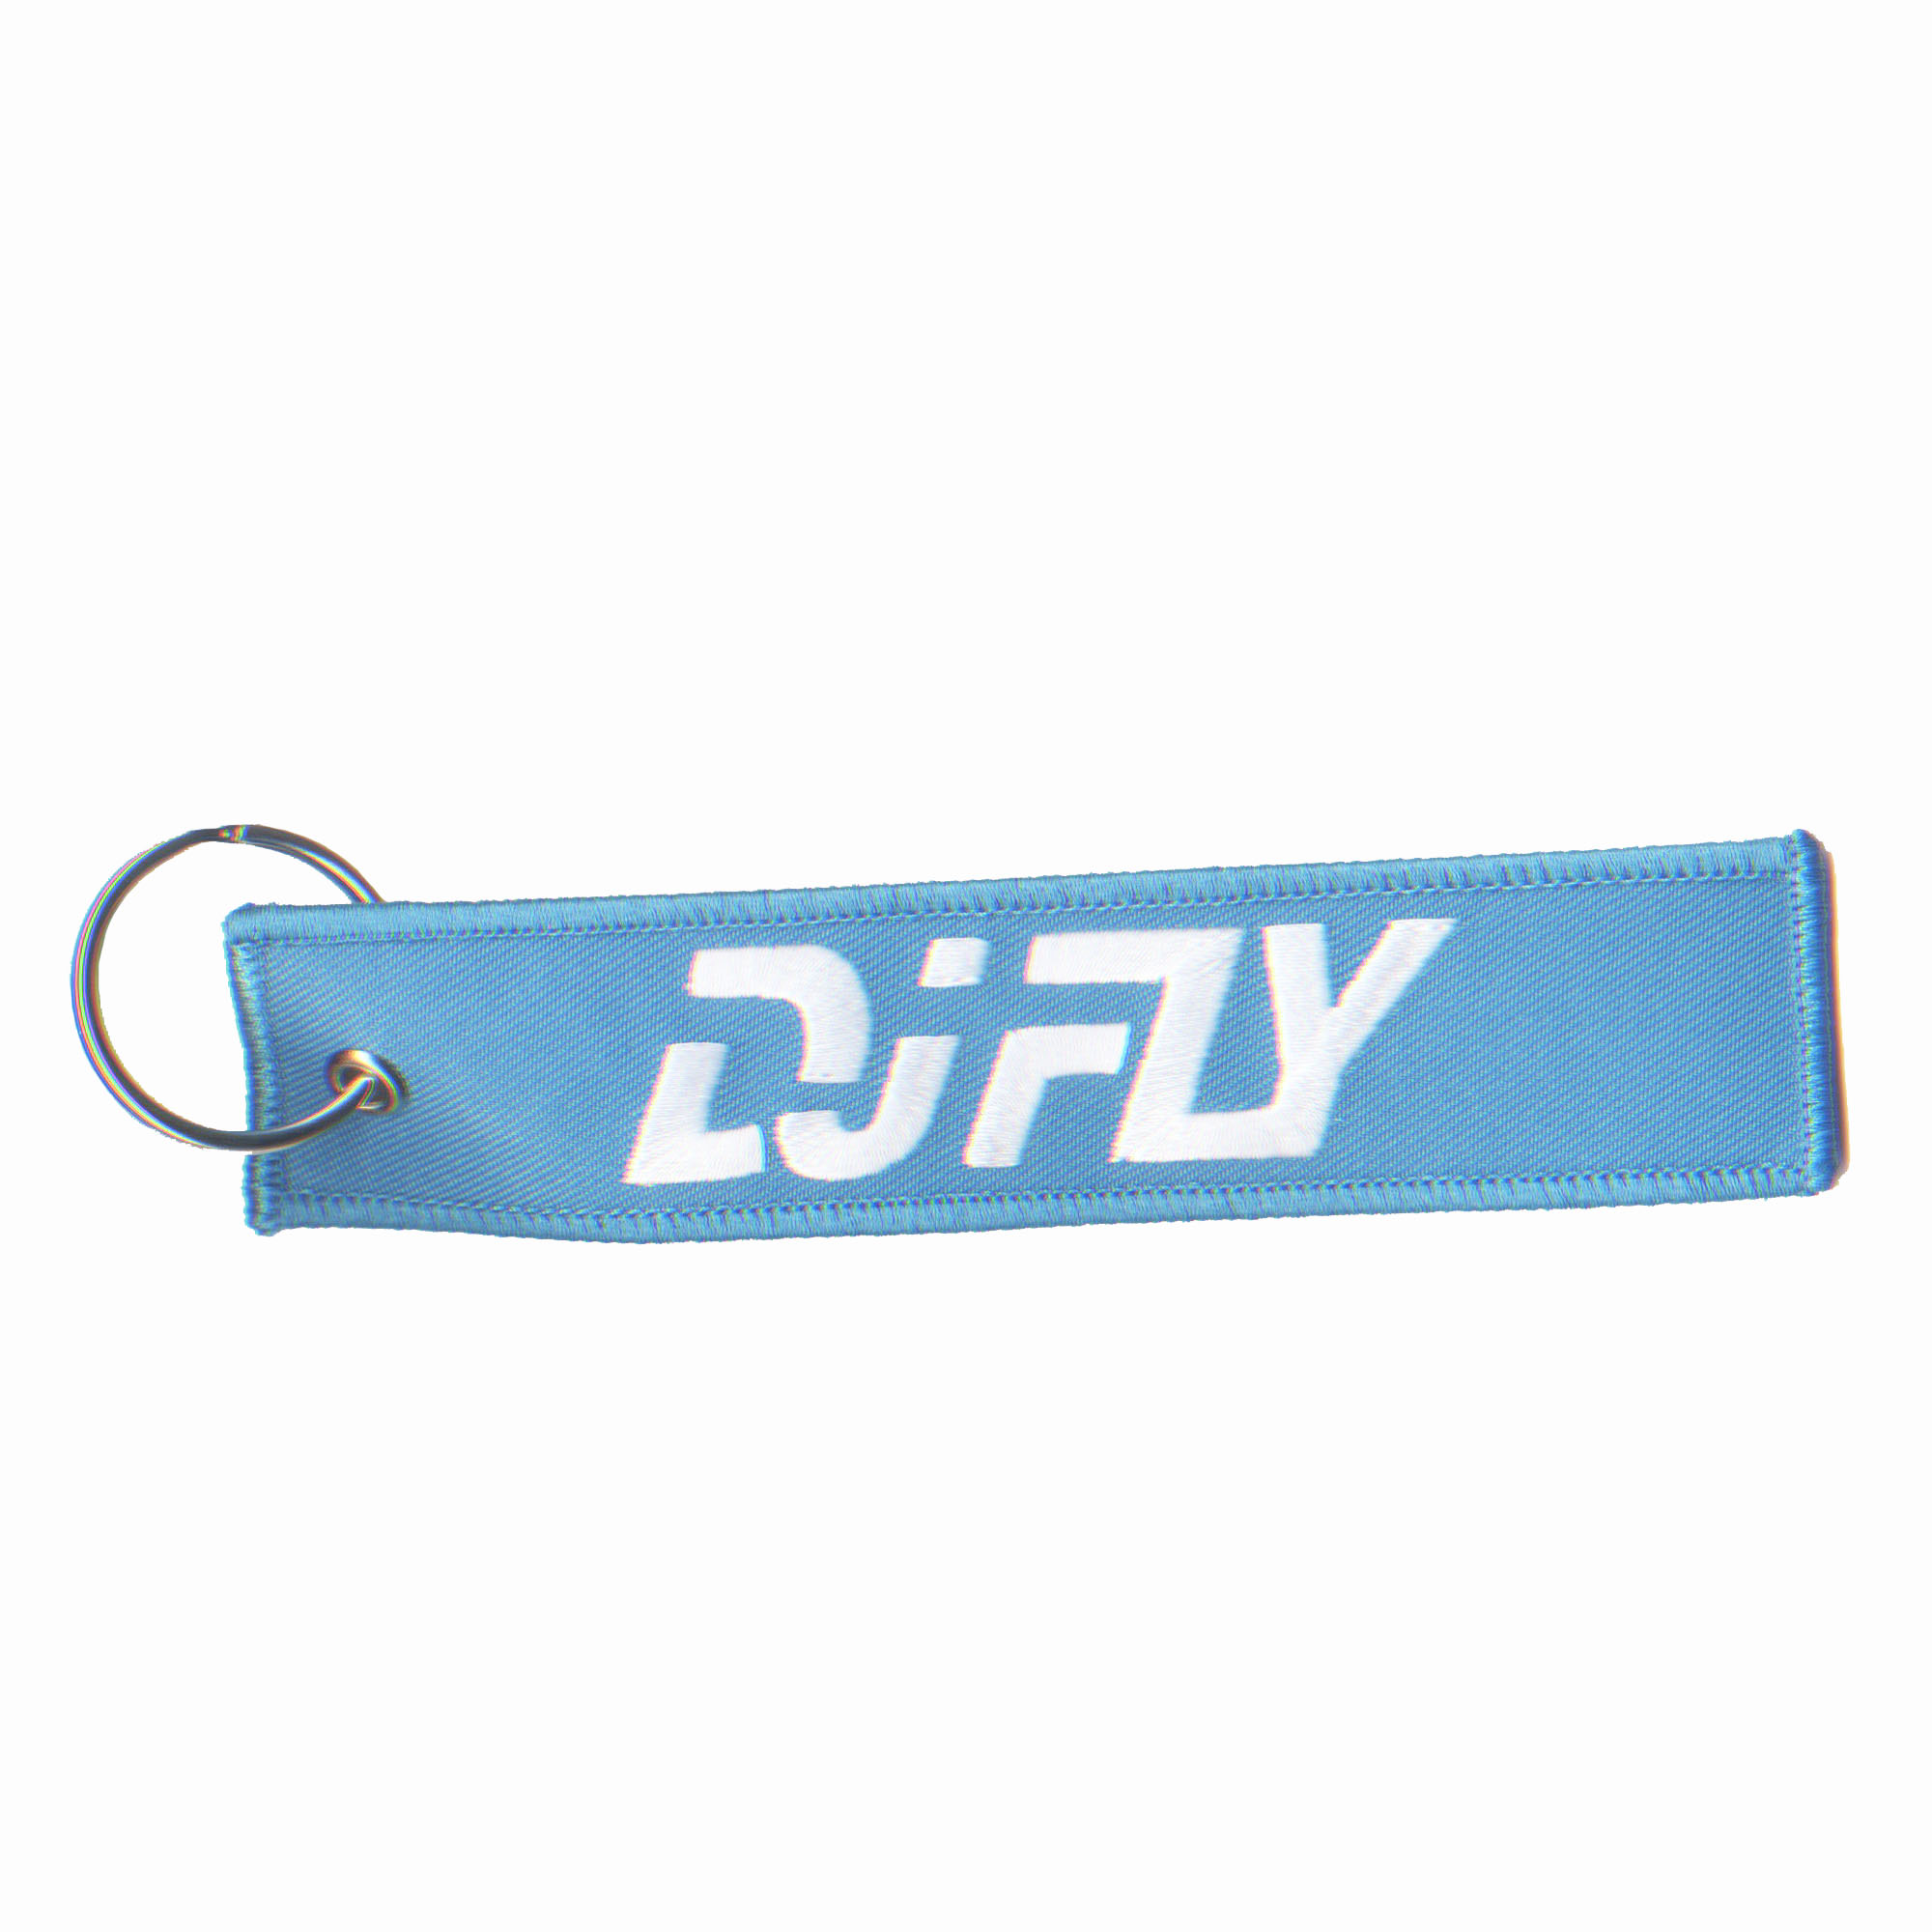 DJ-FLY-porte-clefs-bleu-recto